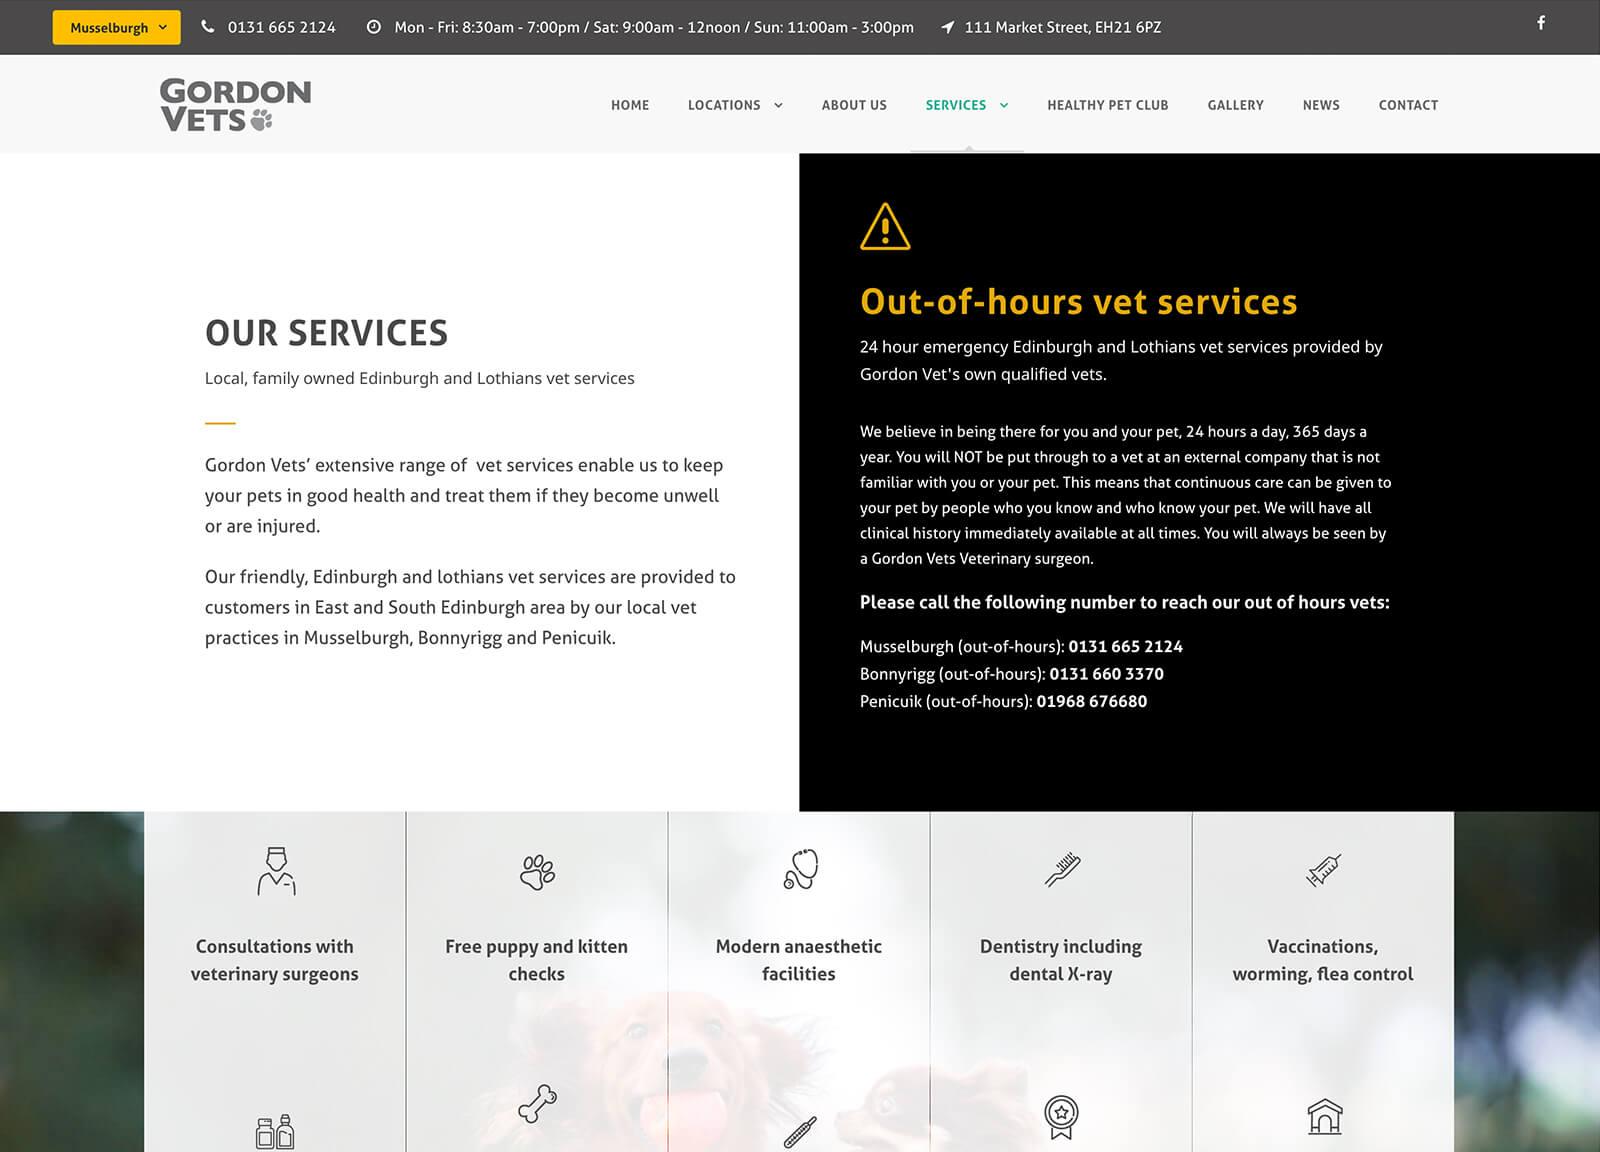 Vet Services page - Gordon Vets website design